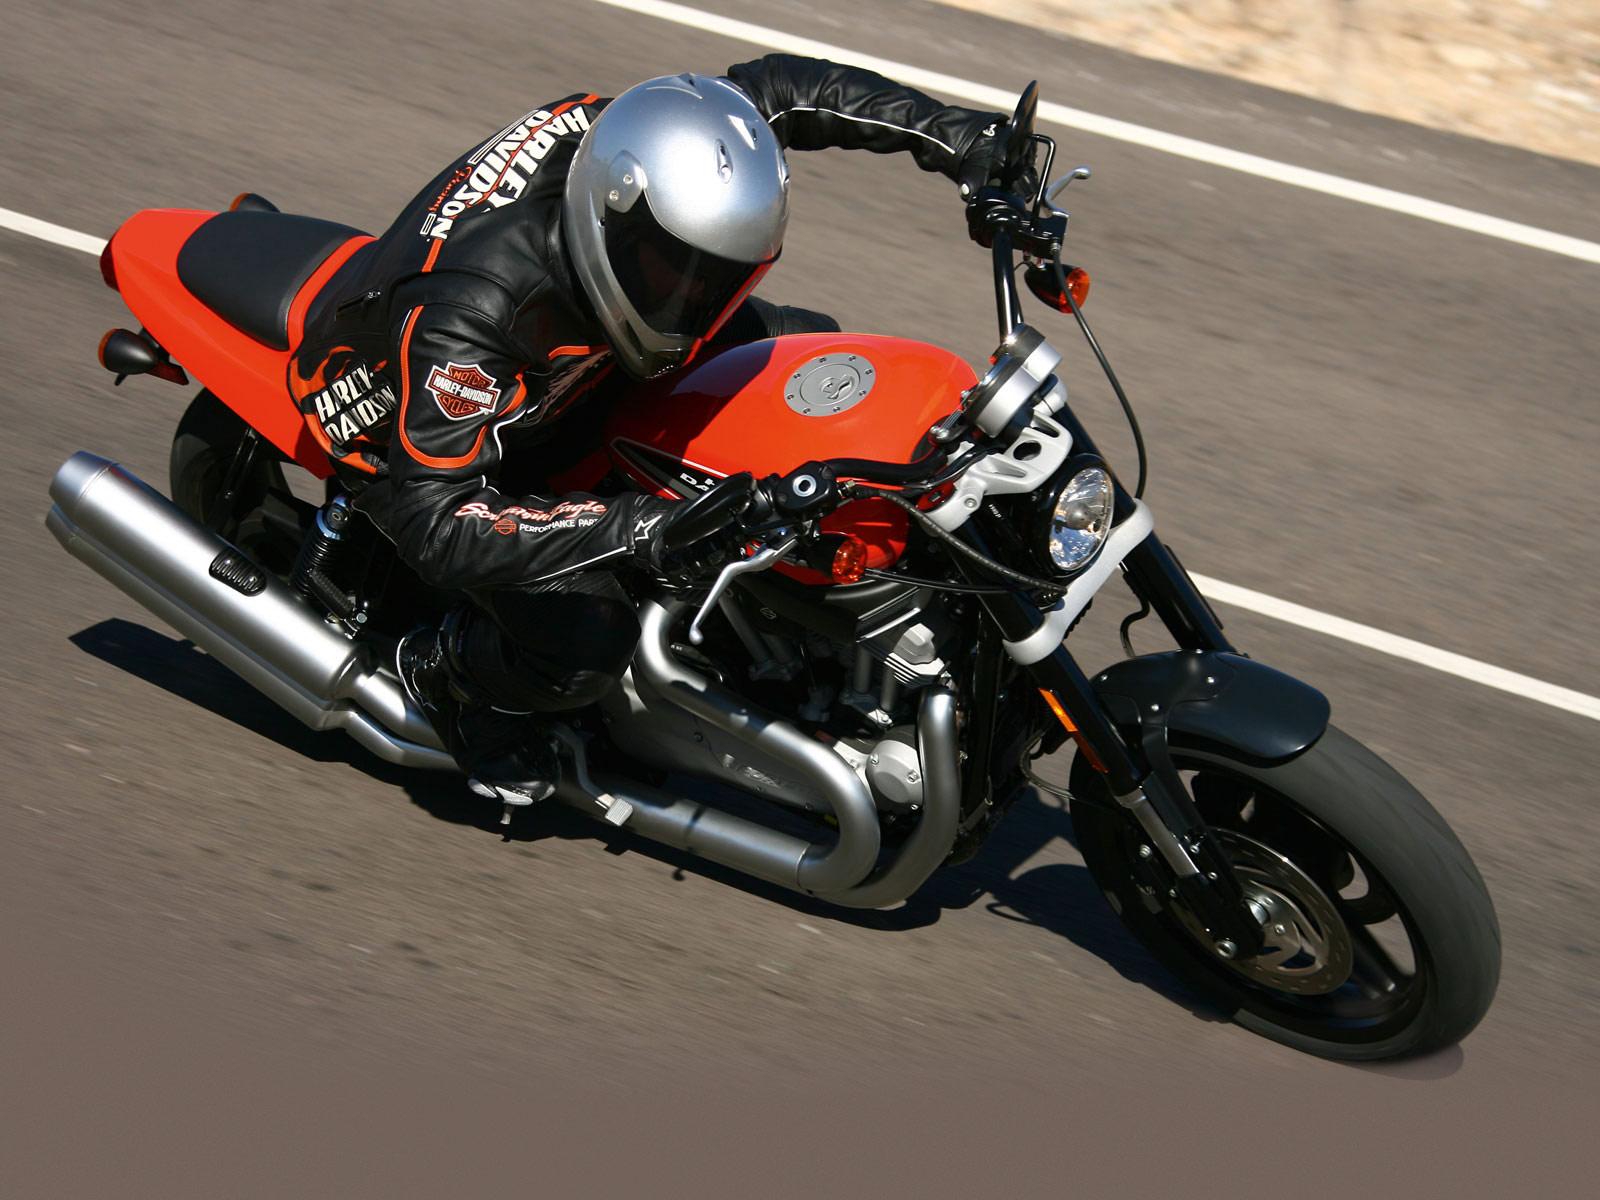 Harley Davidson: Accident Lawyers. Harley-Davidson 1200R Sportster 1200